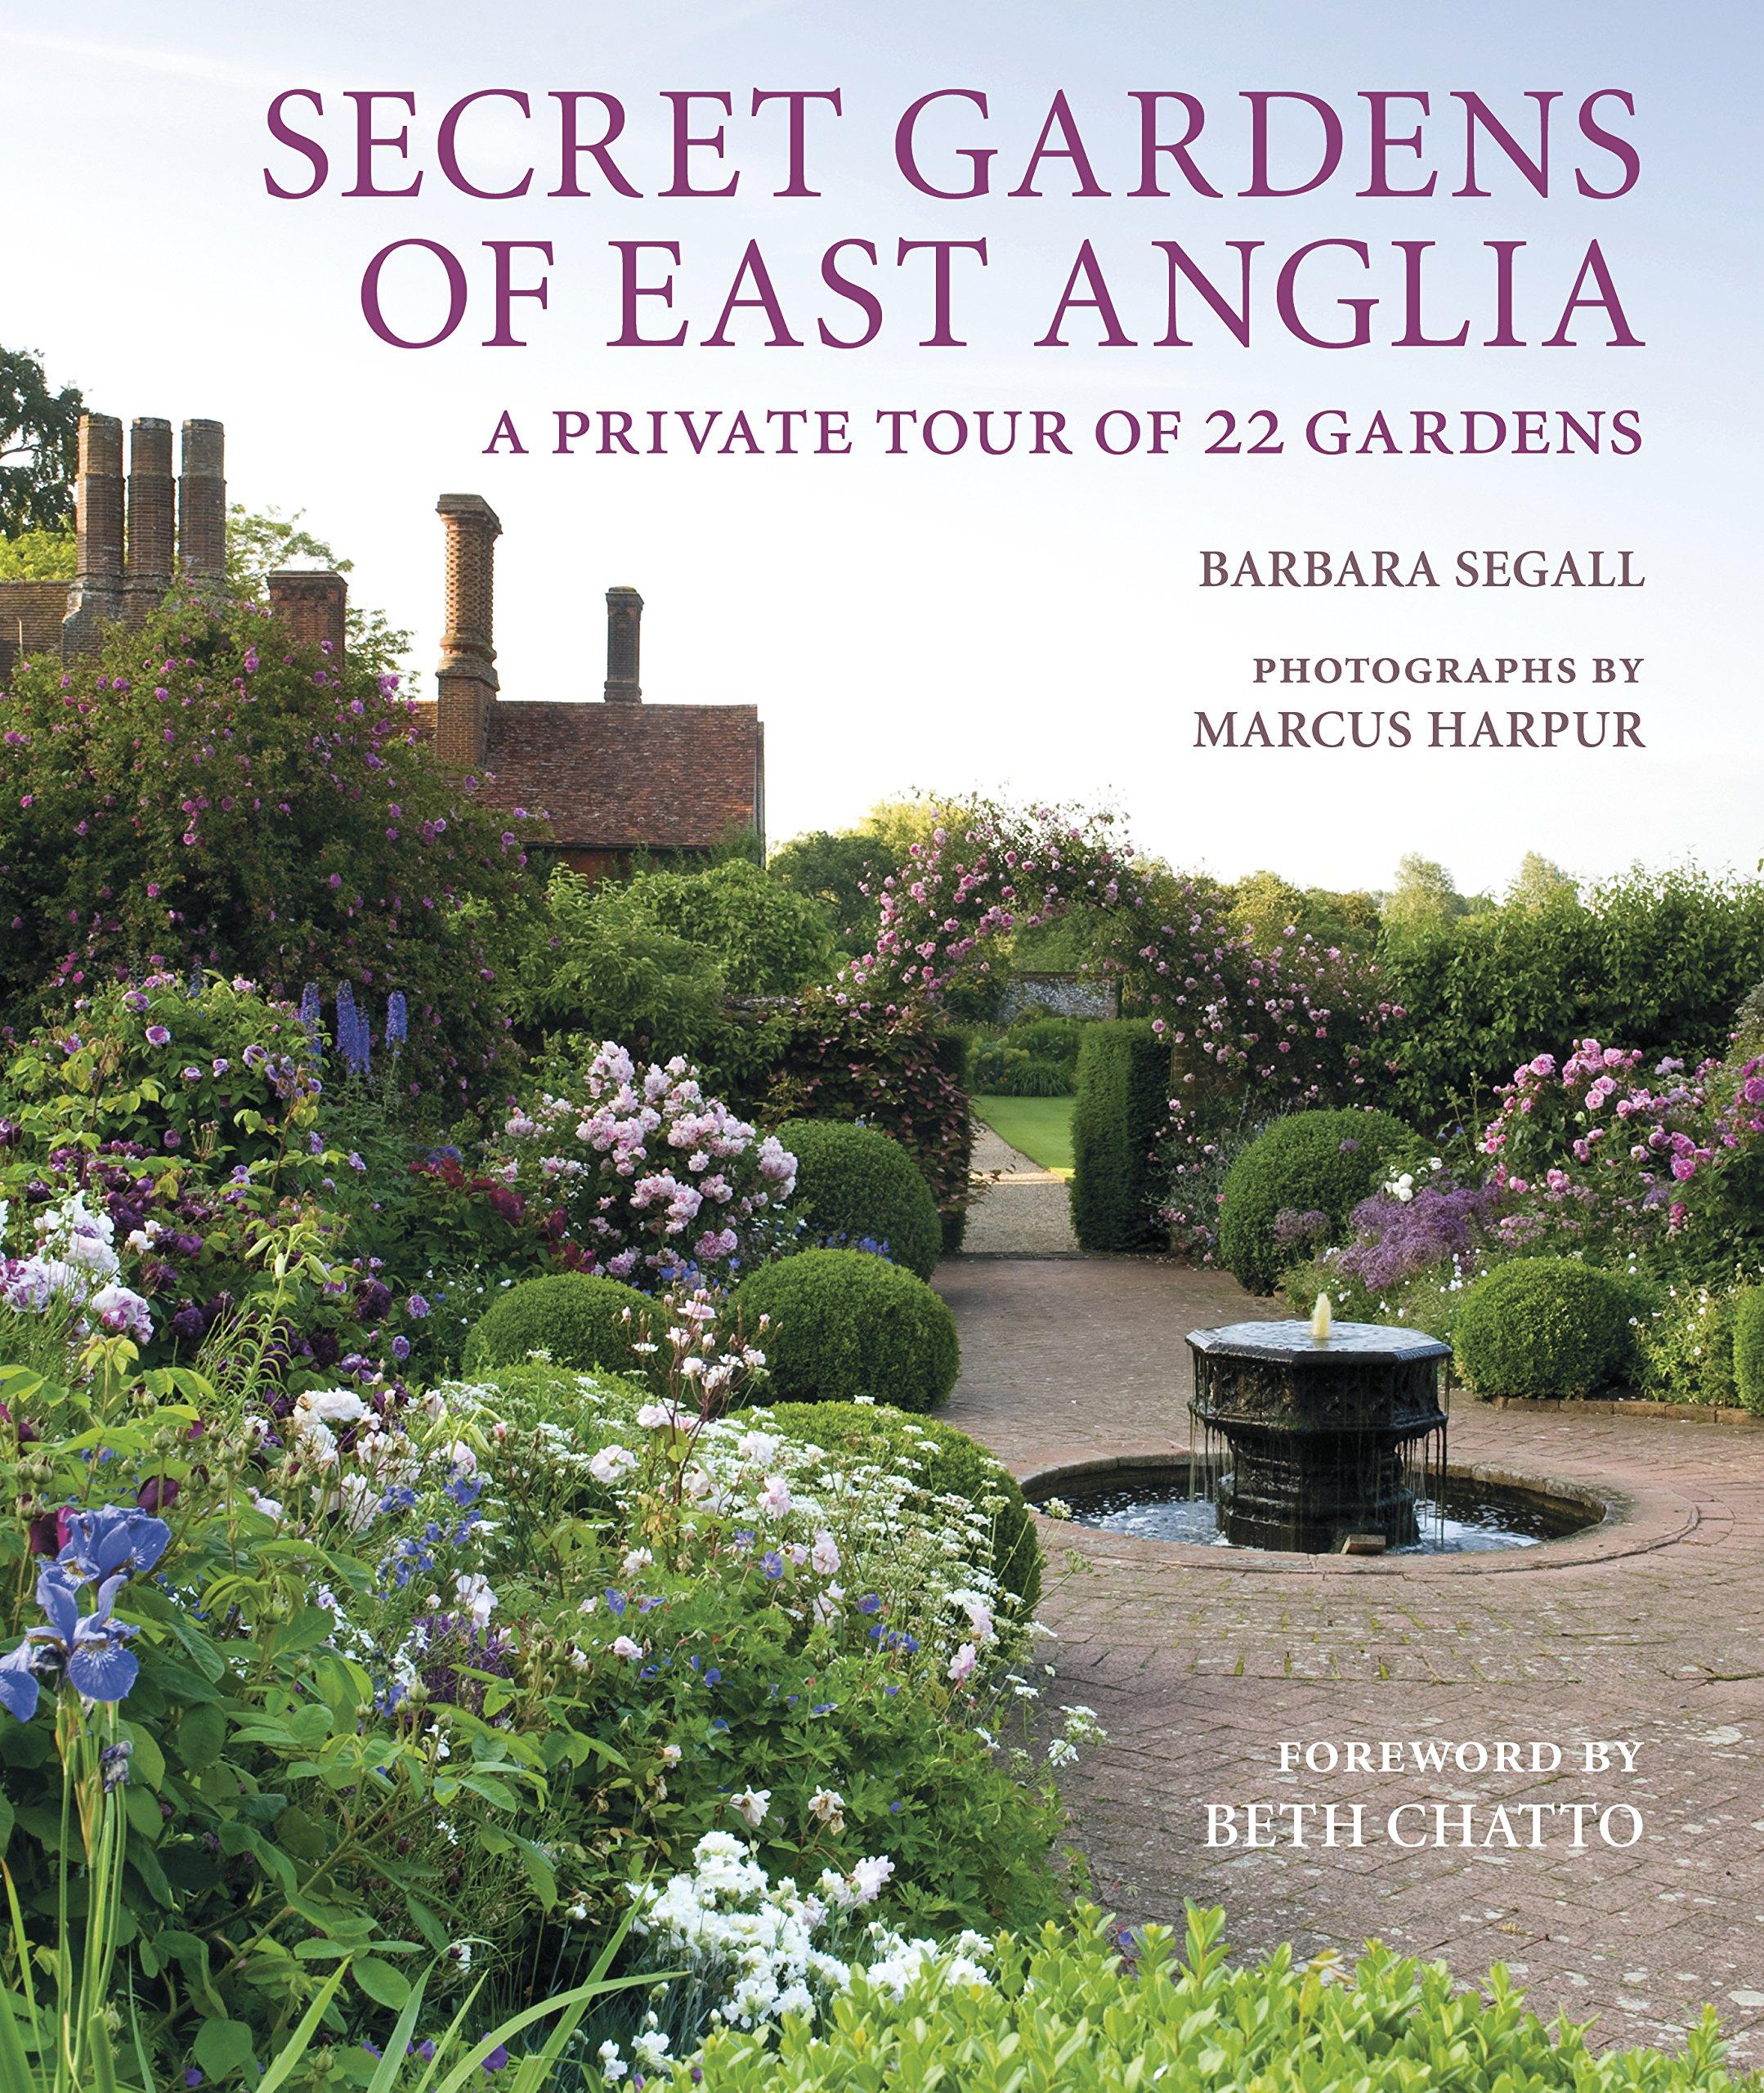 Secret Gardens of East Anglia Hardcover – September 7, 2017 Barbara Segall Marcus Harpur Frances Lincoln 0711238596